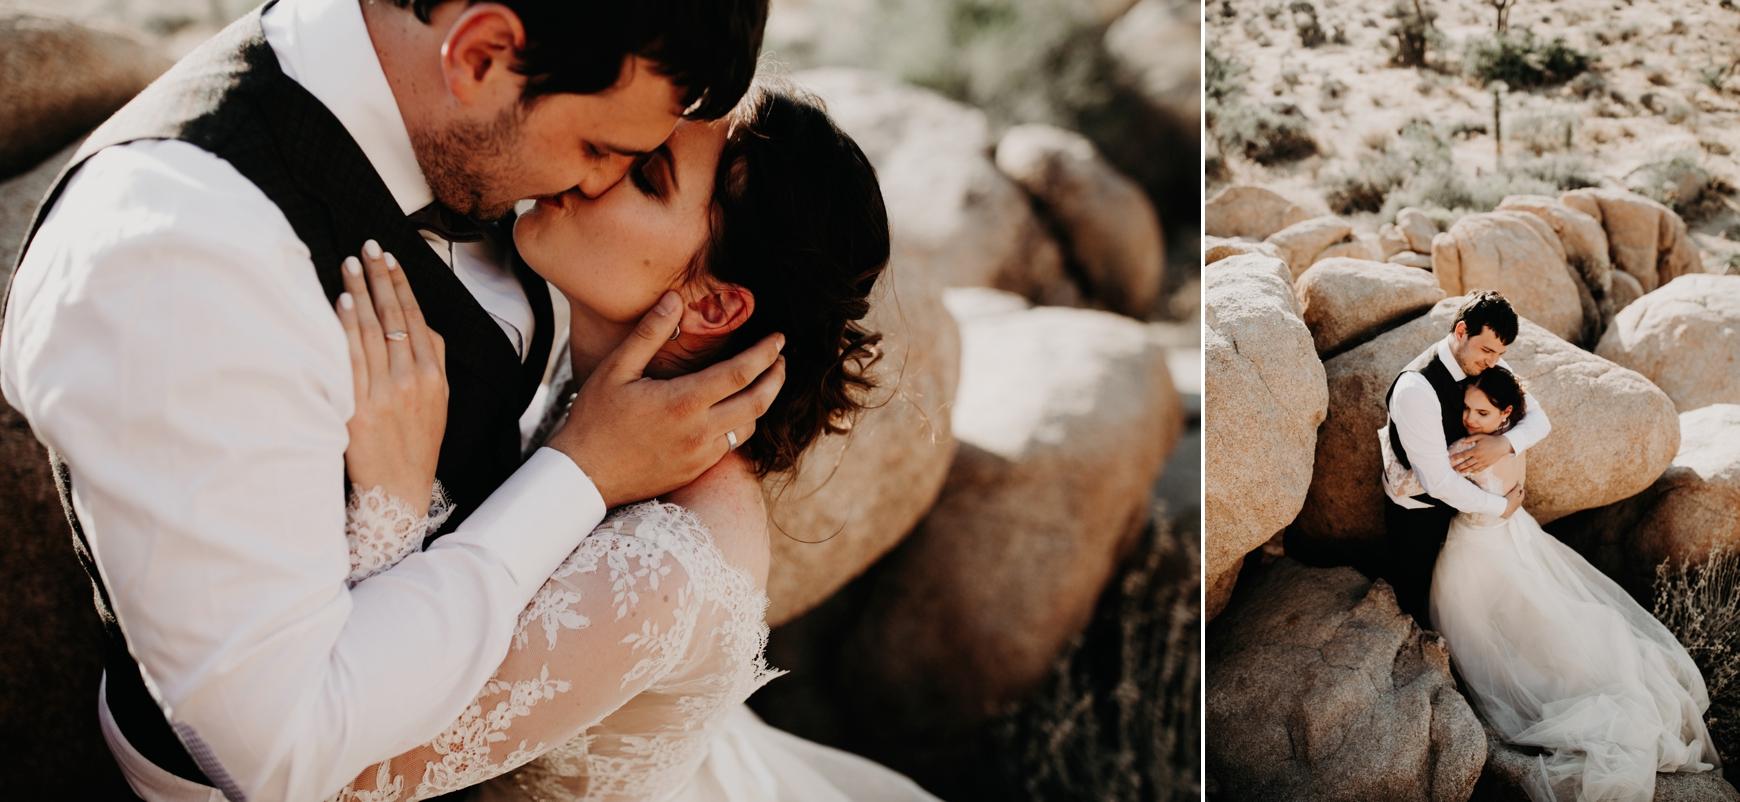 Joshua Tree Bridal Portraits Anastasia & Andrey Emily Magers Photography-42.jpg